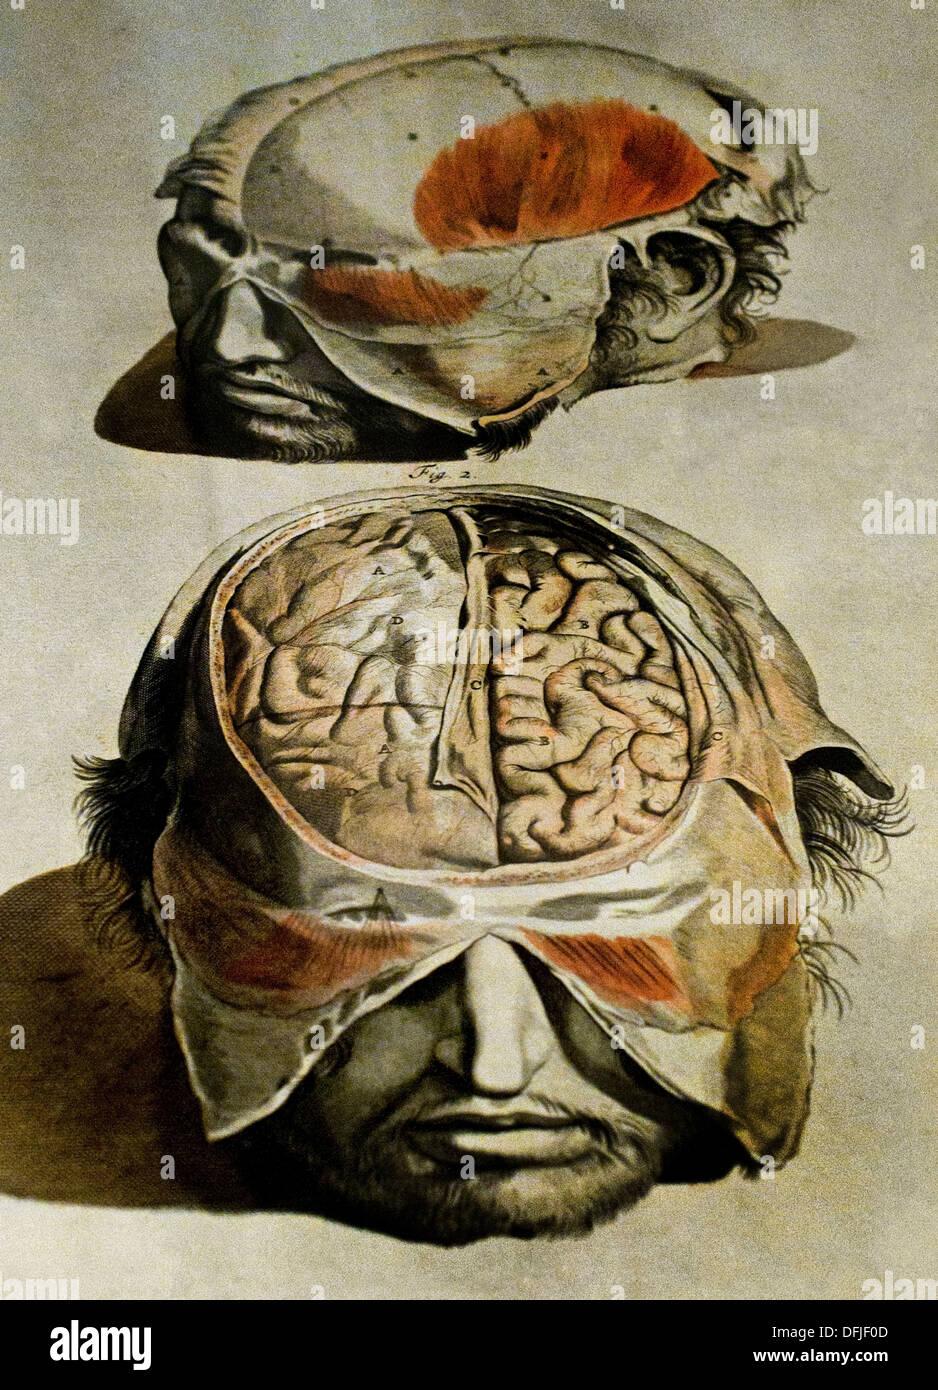 De Re Anatomica Libri XV 1559 ( Open Skull ) Museum Painting Venice Italy Italian Stock Photo